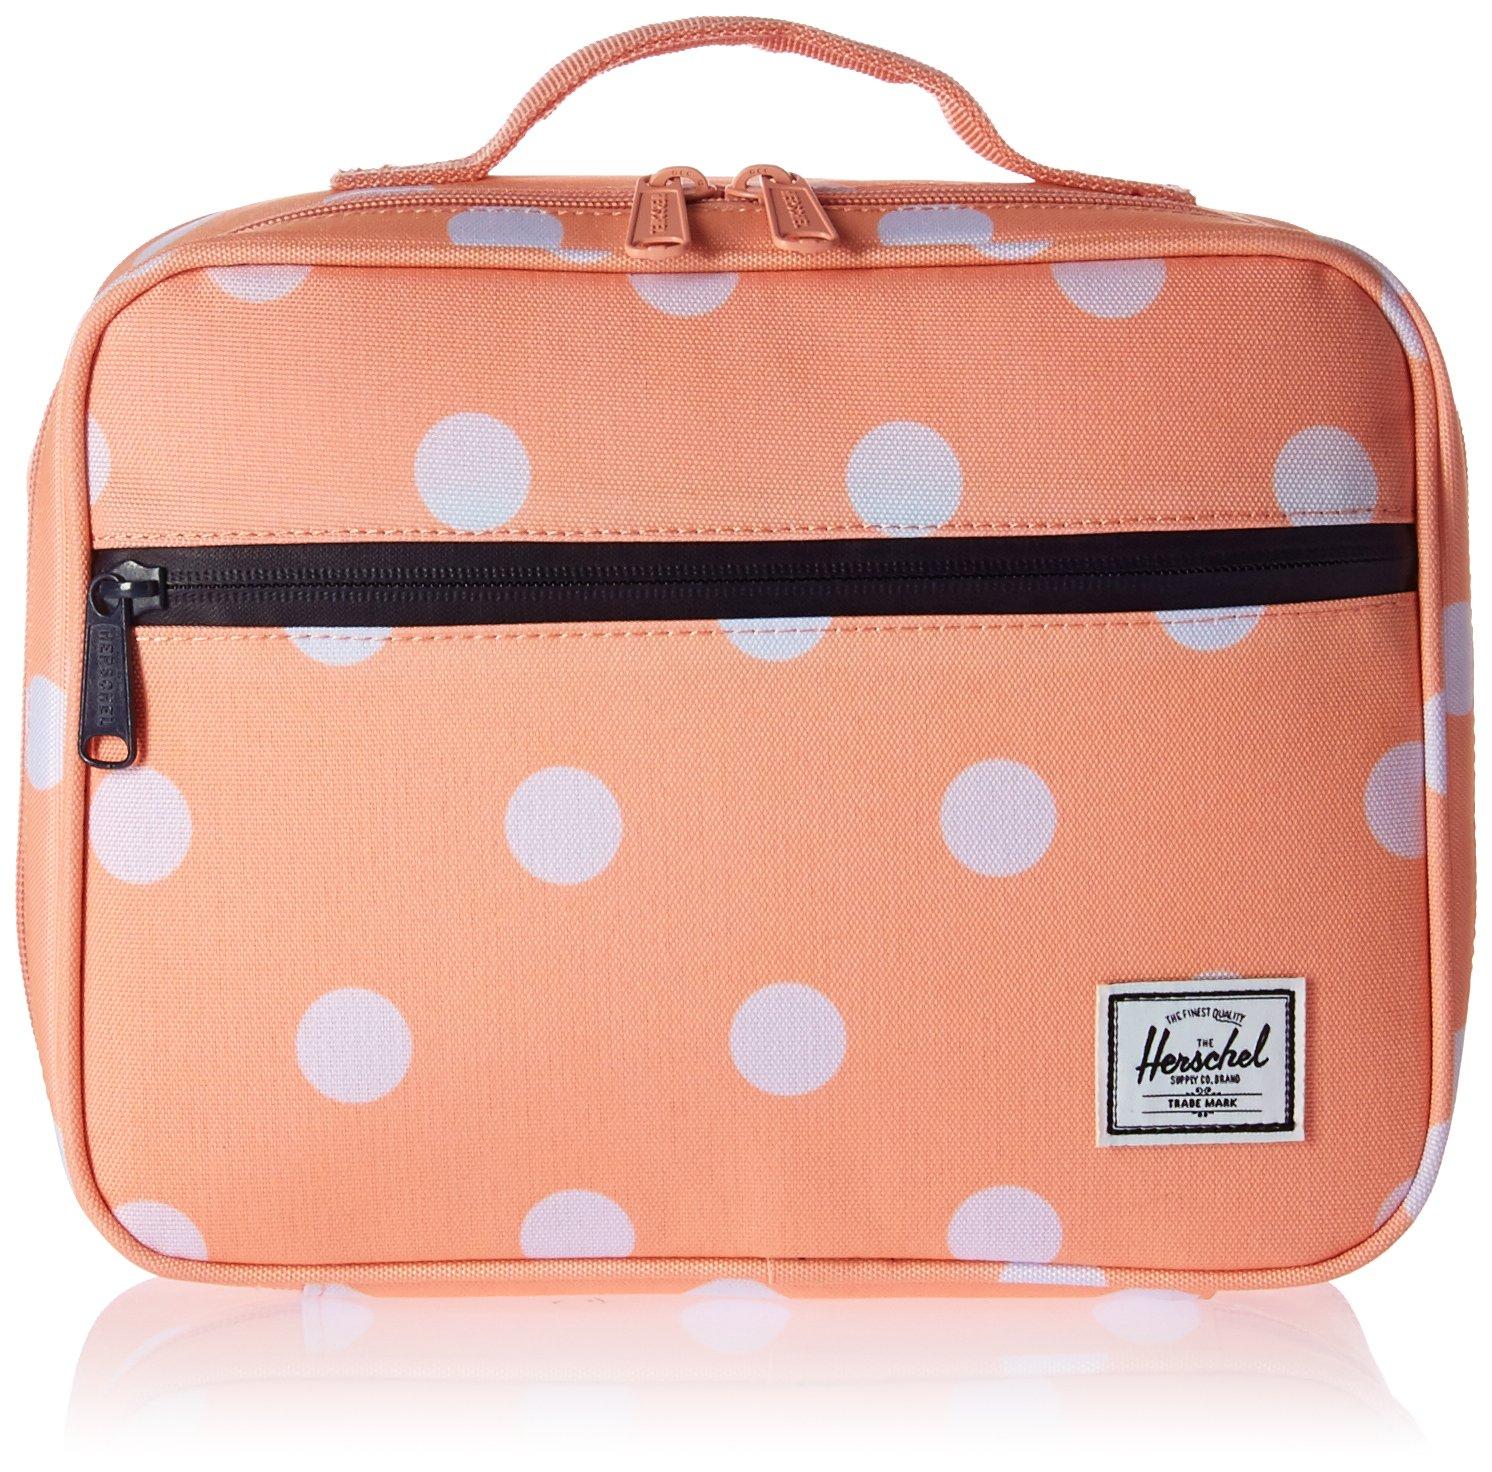 Amazon.com | Herschel Supply Co. Pop Quiz Lunchbox, Peach Polka Dot/Peacoat  | Travel Accessories